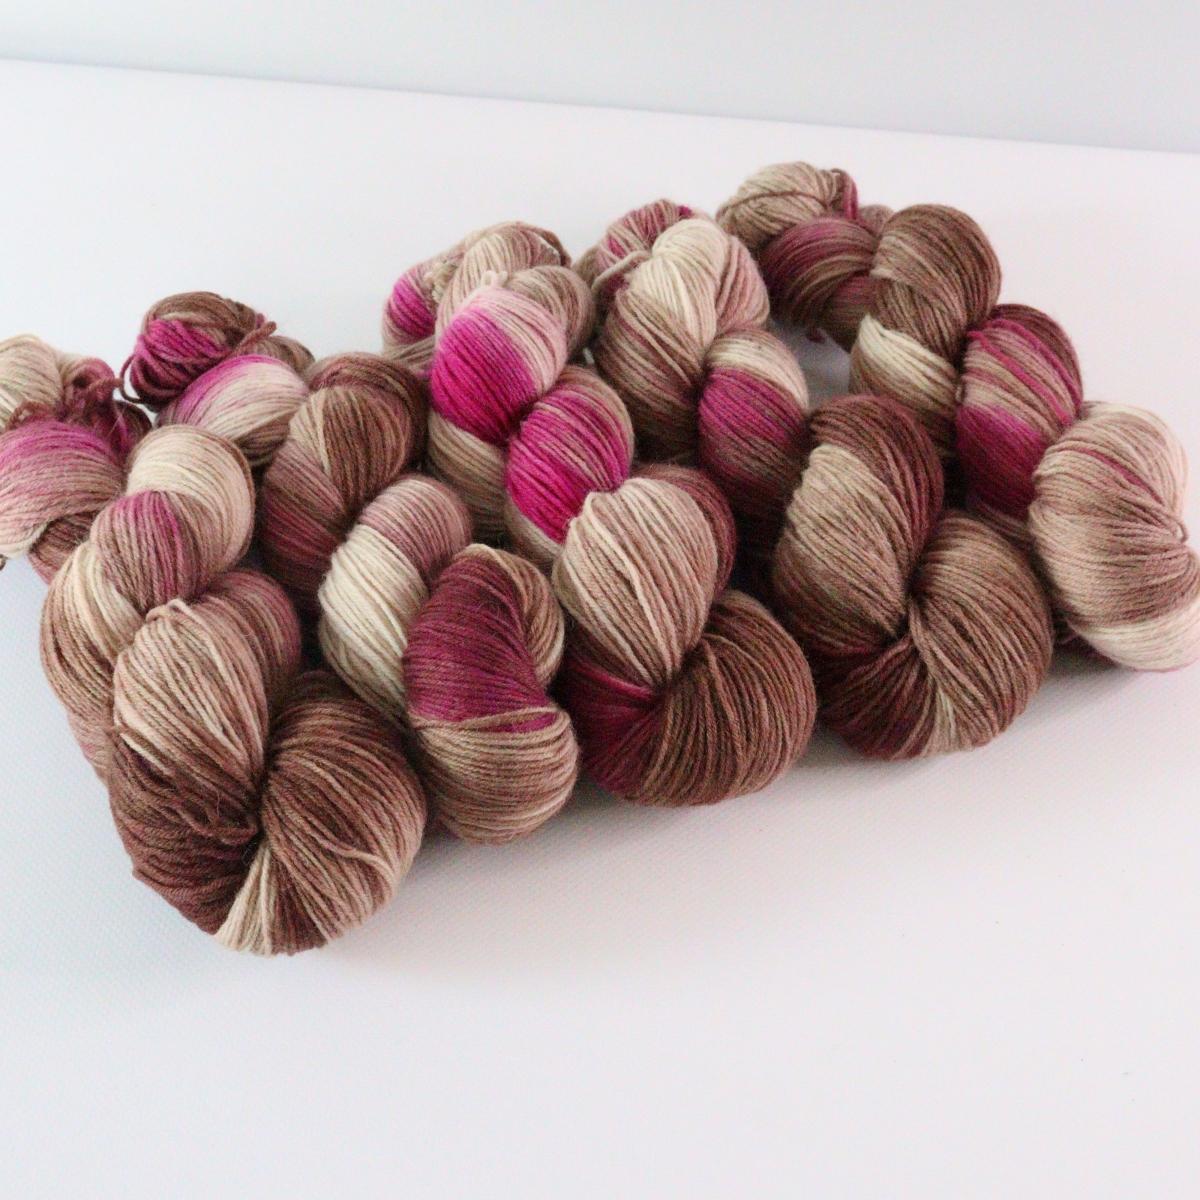 woodico.pro hand dyed yarn 073 1 1200x1200 - Hand dyed yarn / 073